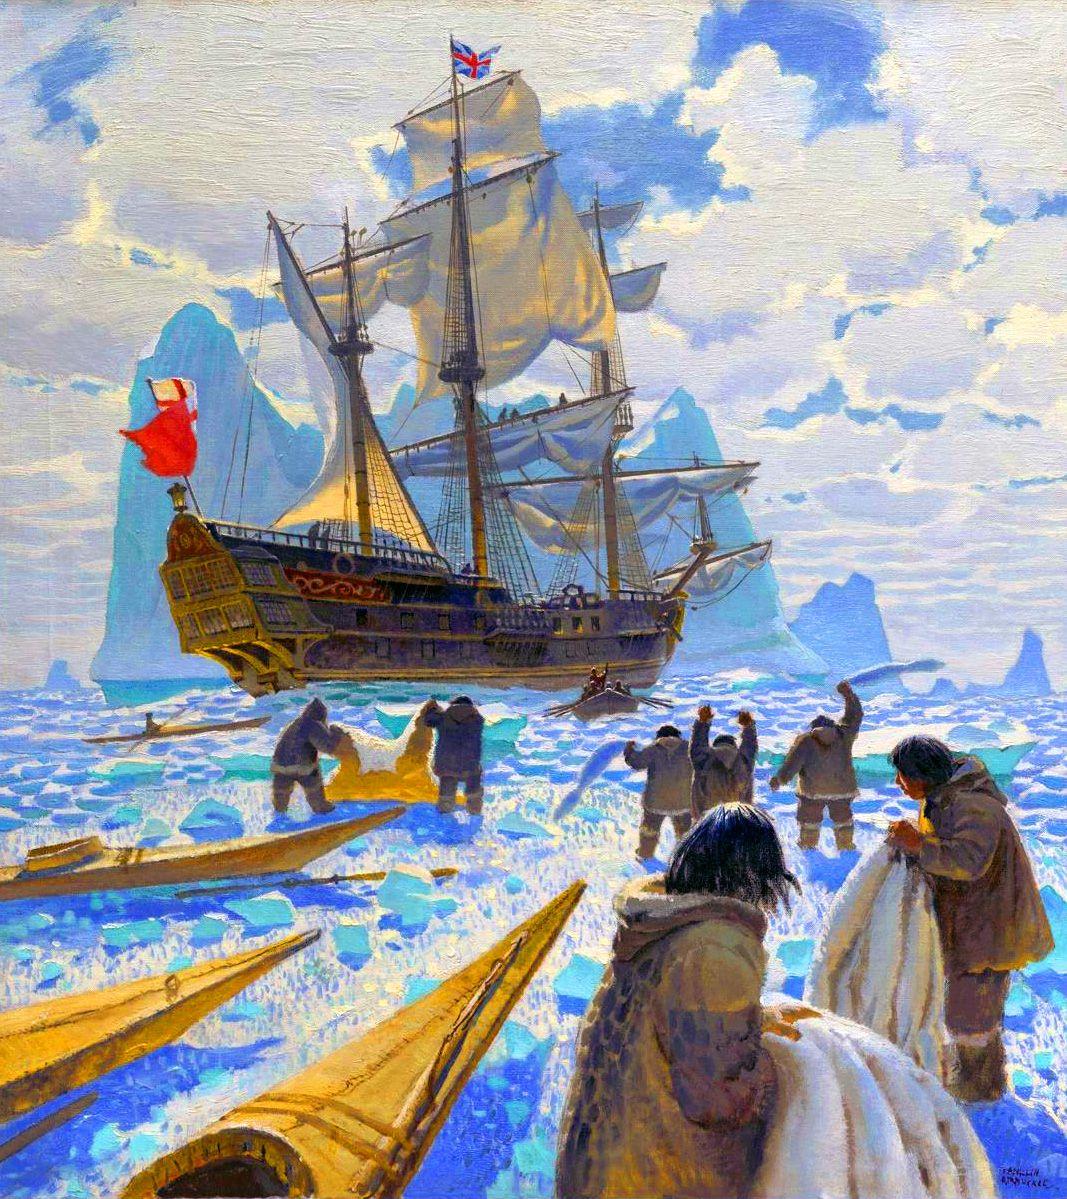 British Hudson Bay Company warship trading with the Canadian Eskimos